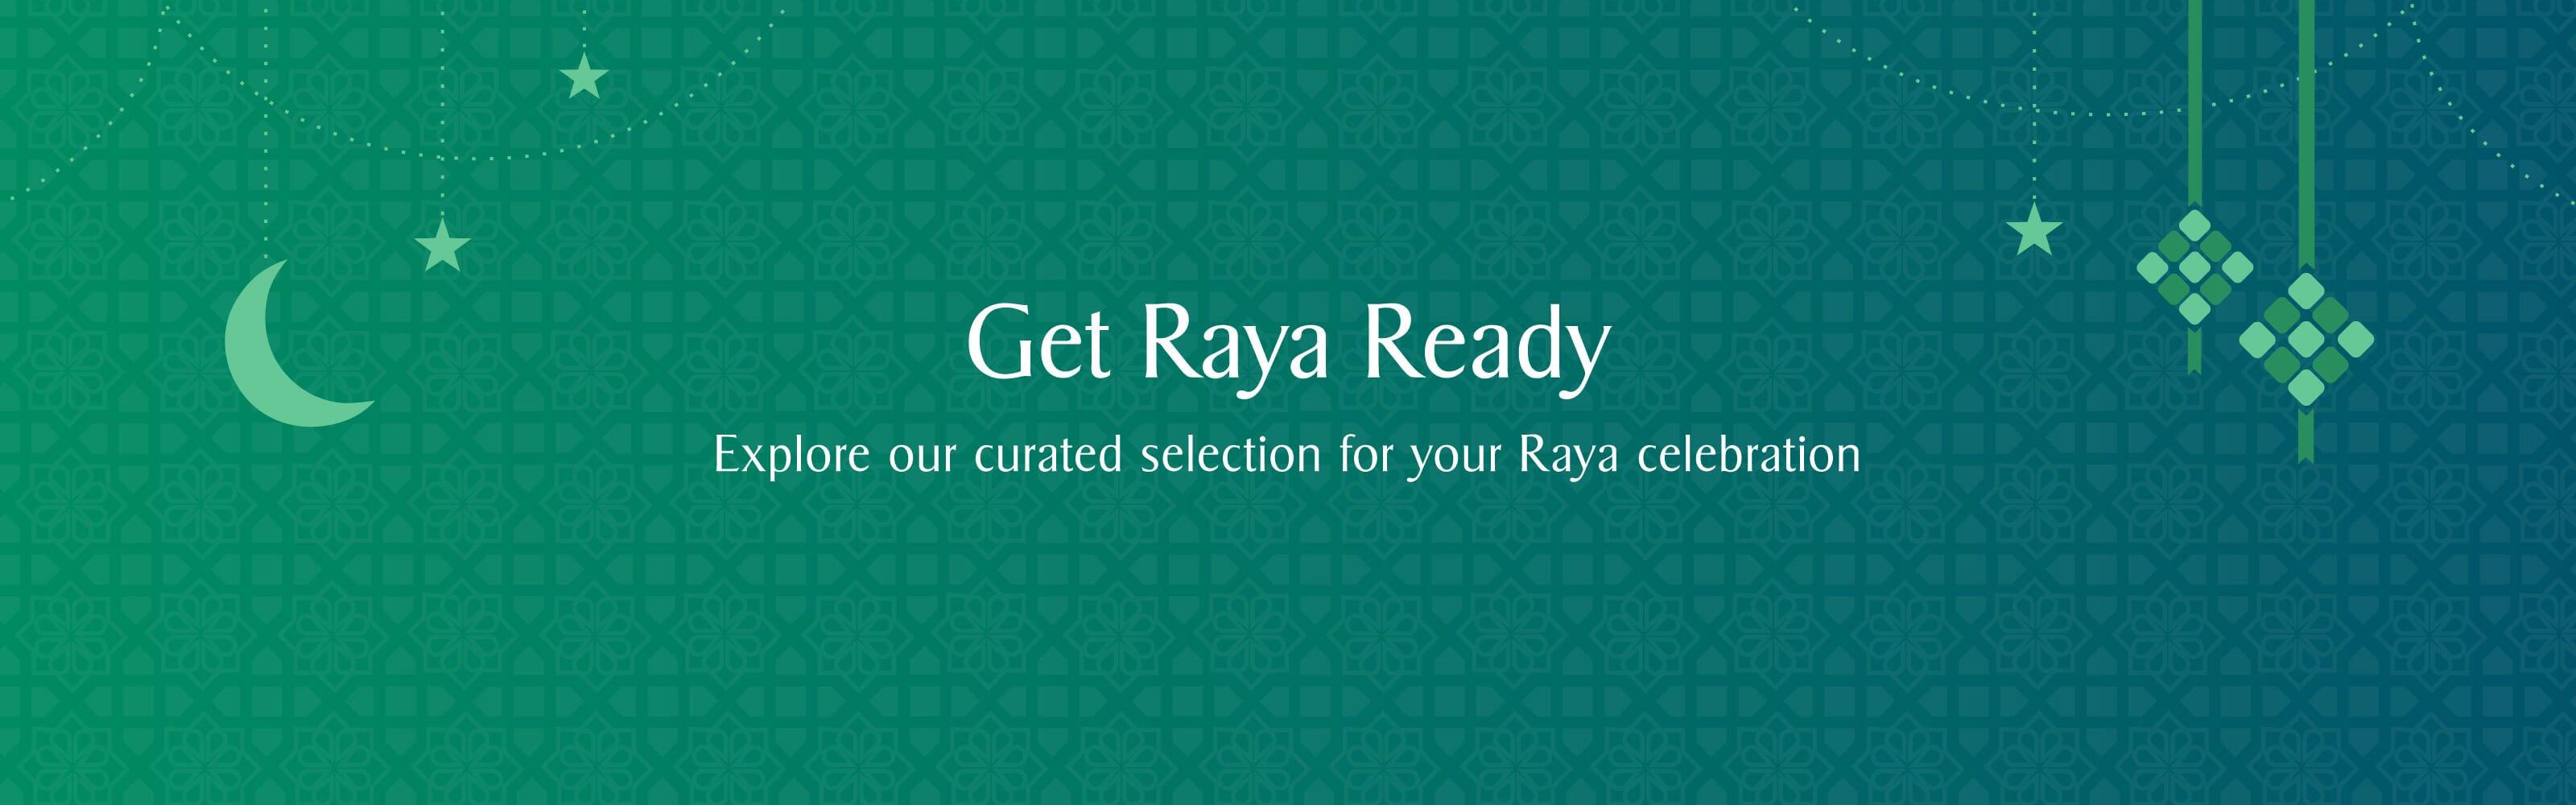 Get Raya Ready